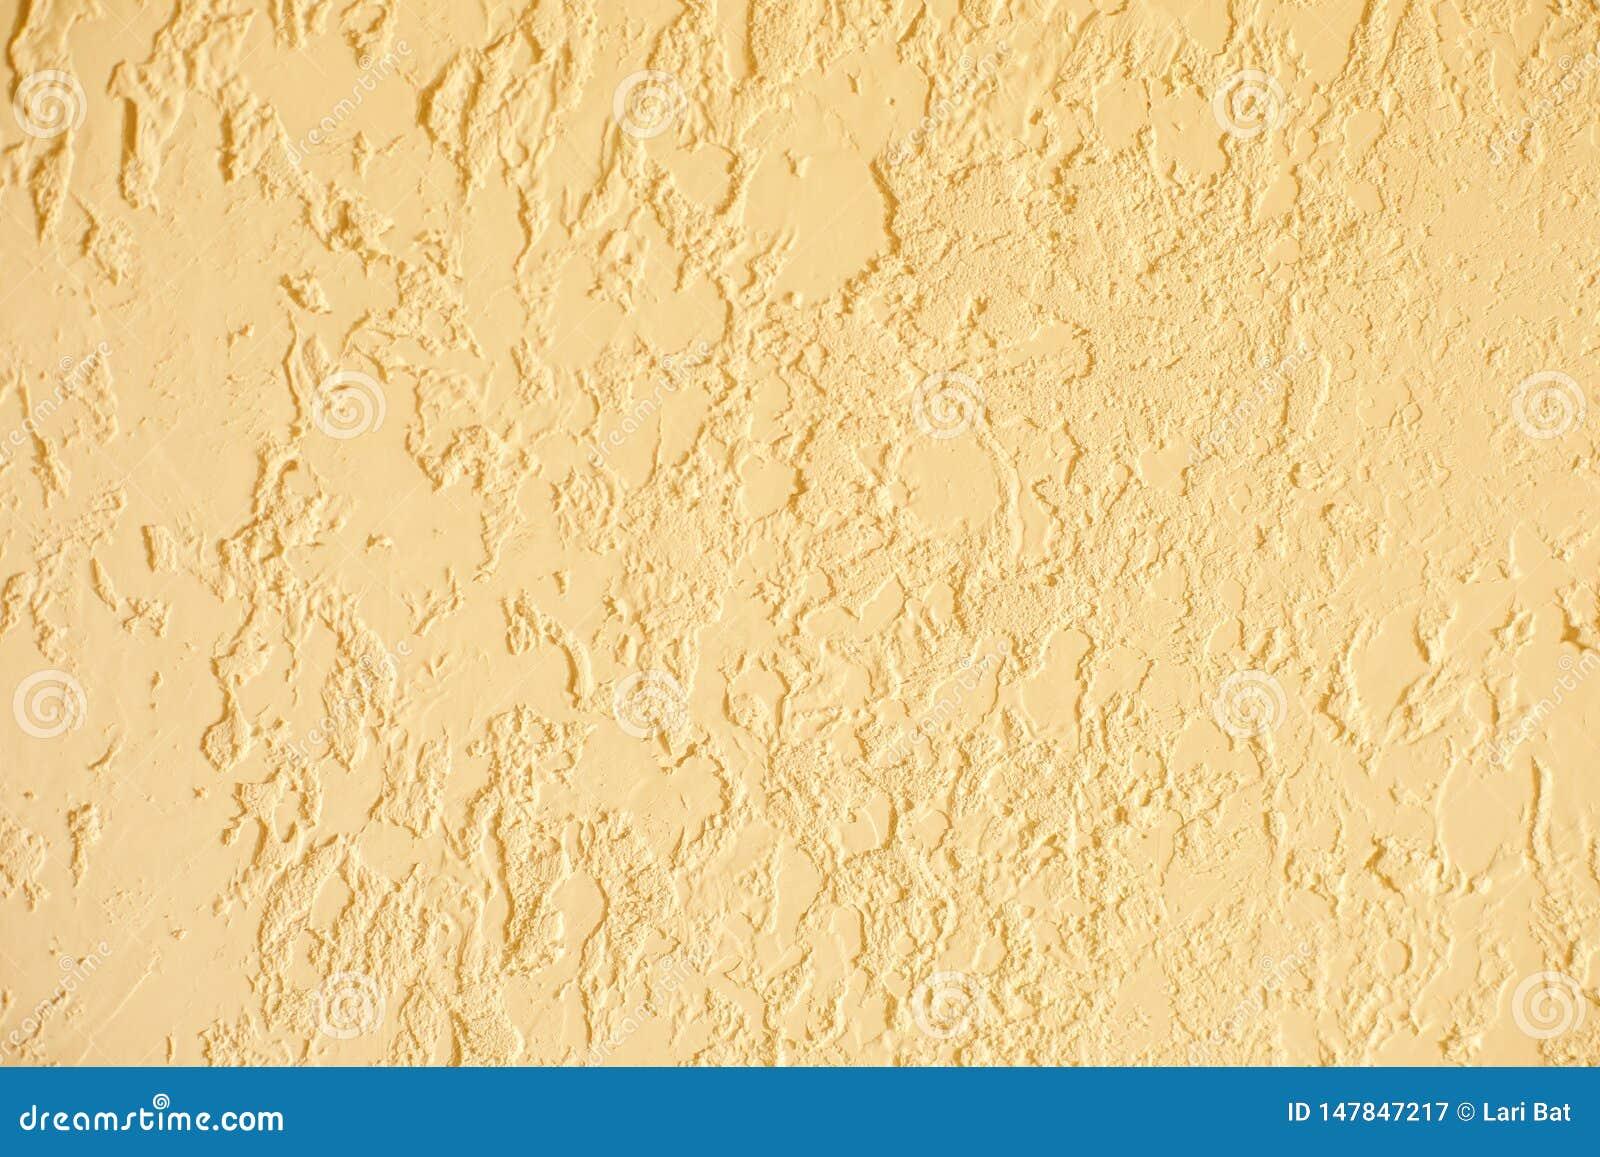 Sand color textured plastered wall. Fresh otvetka in commercial premises, designer renovation in the house